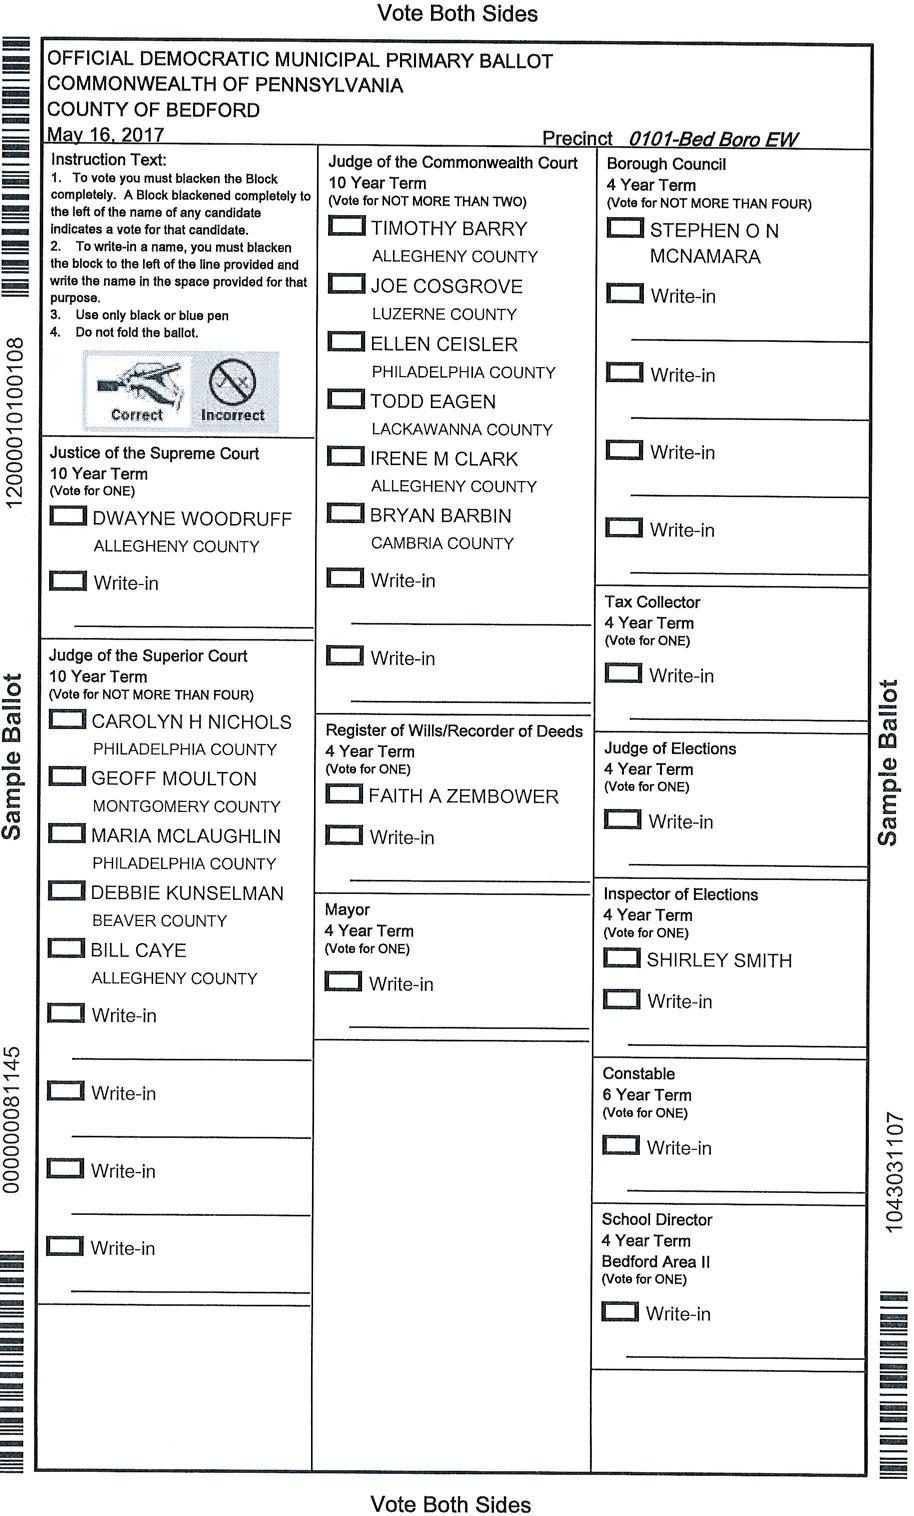 Bedford County Democrats